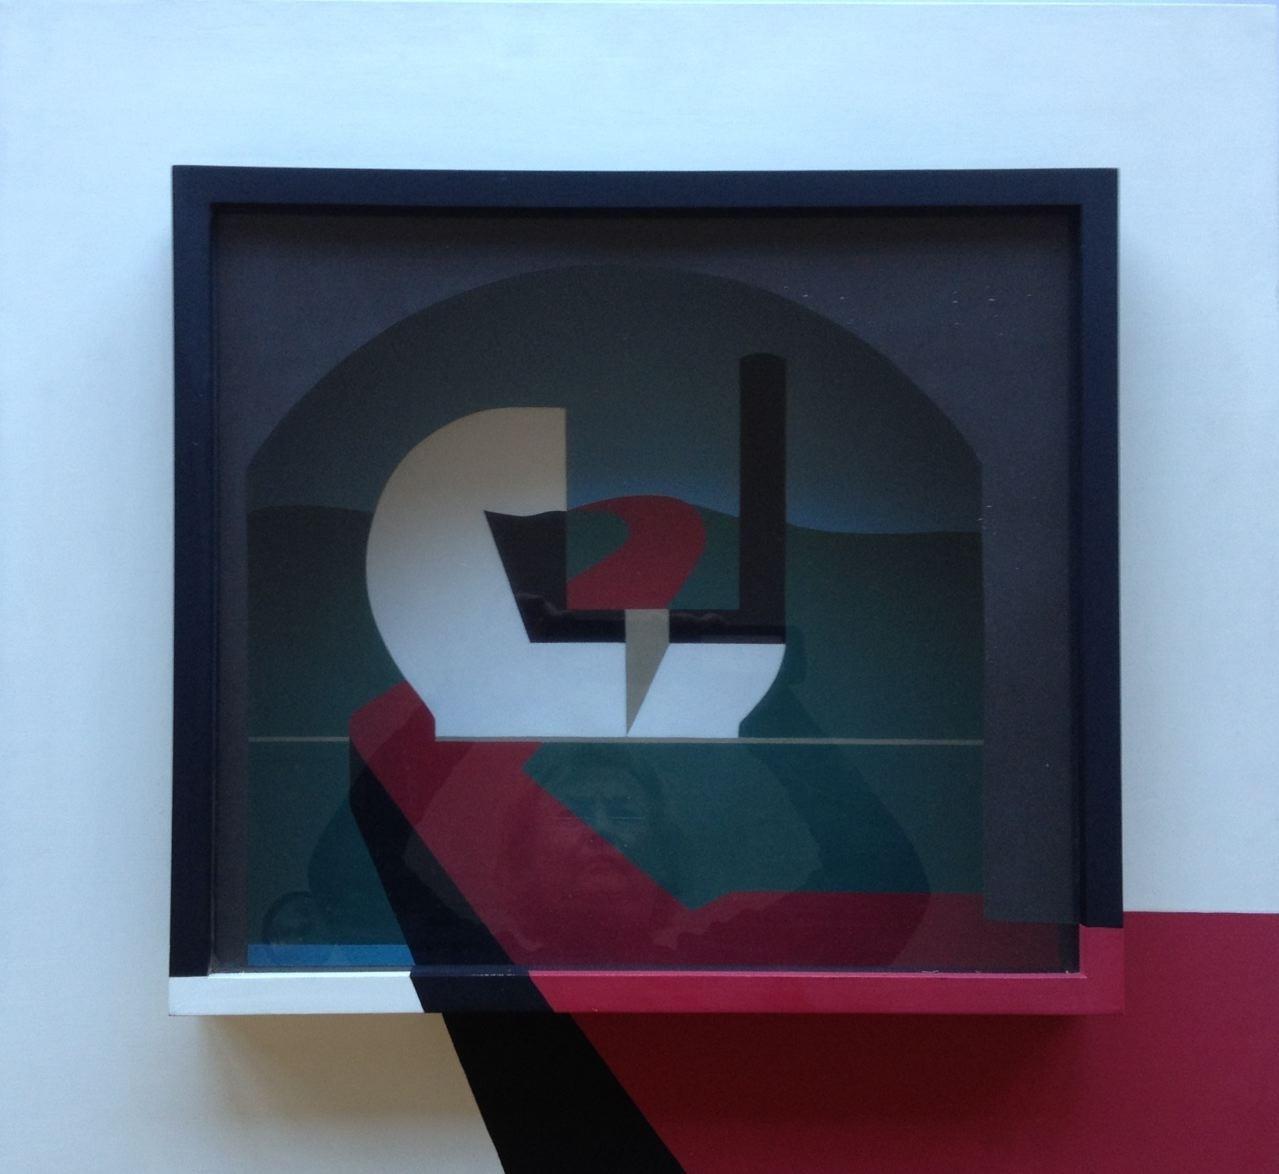 Pfeilgenau, Raumschnitt, Holzkasten verglast, 60 x 65 x 14 cm, 1973 (#611)